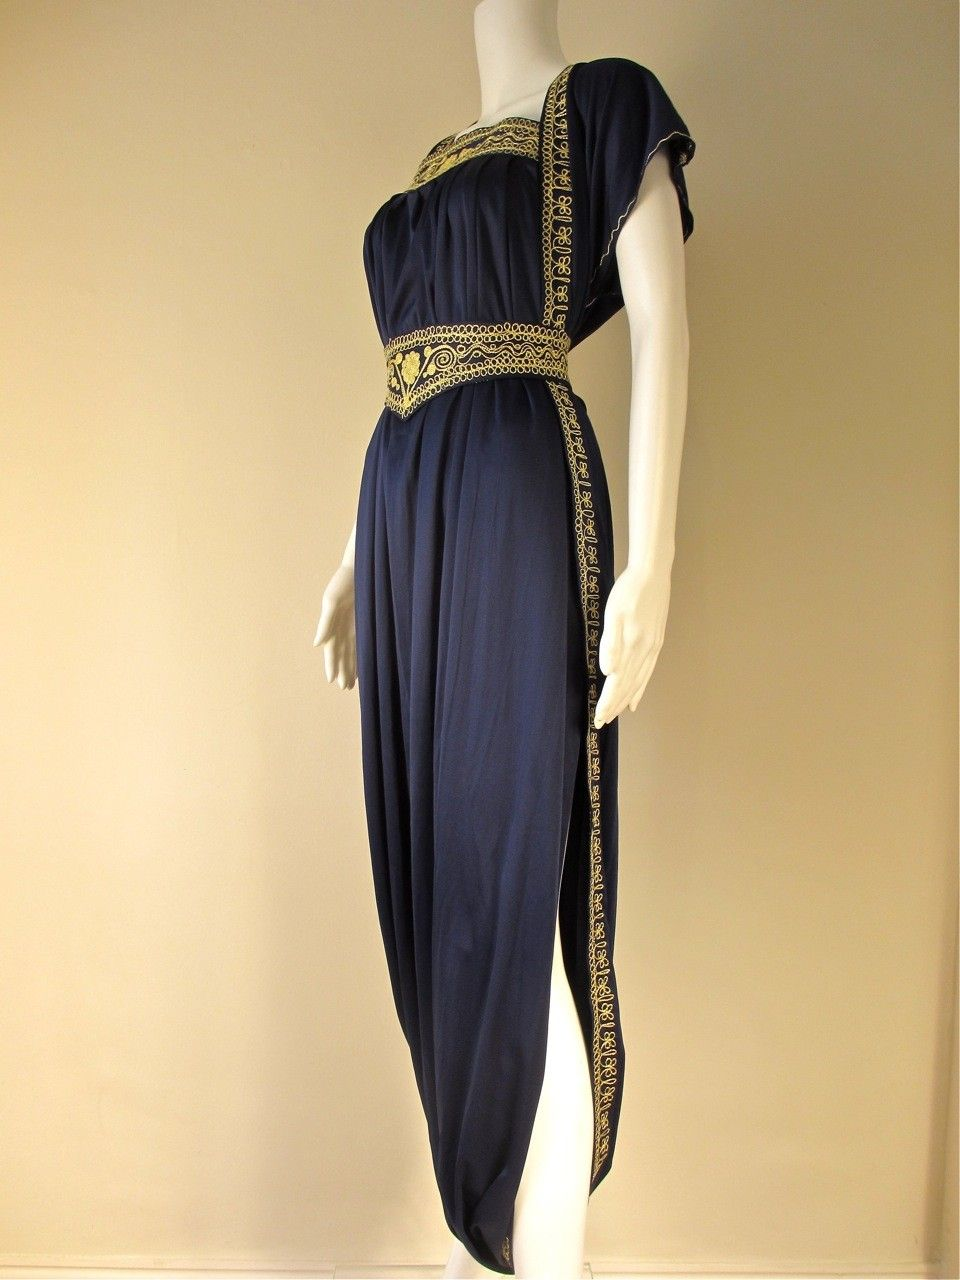 Arabian Theme Party Dresses – Fashion dresses  |Arabian Nights Theme Party Dress